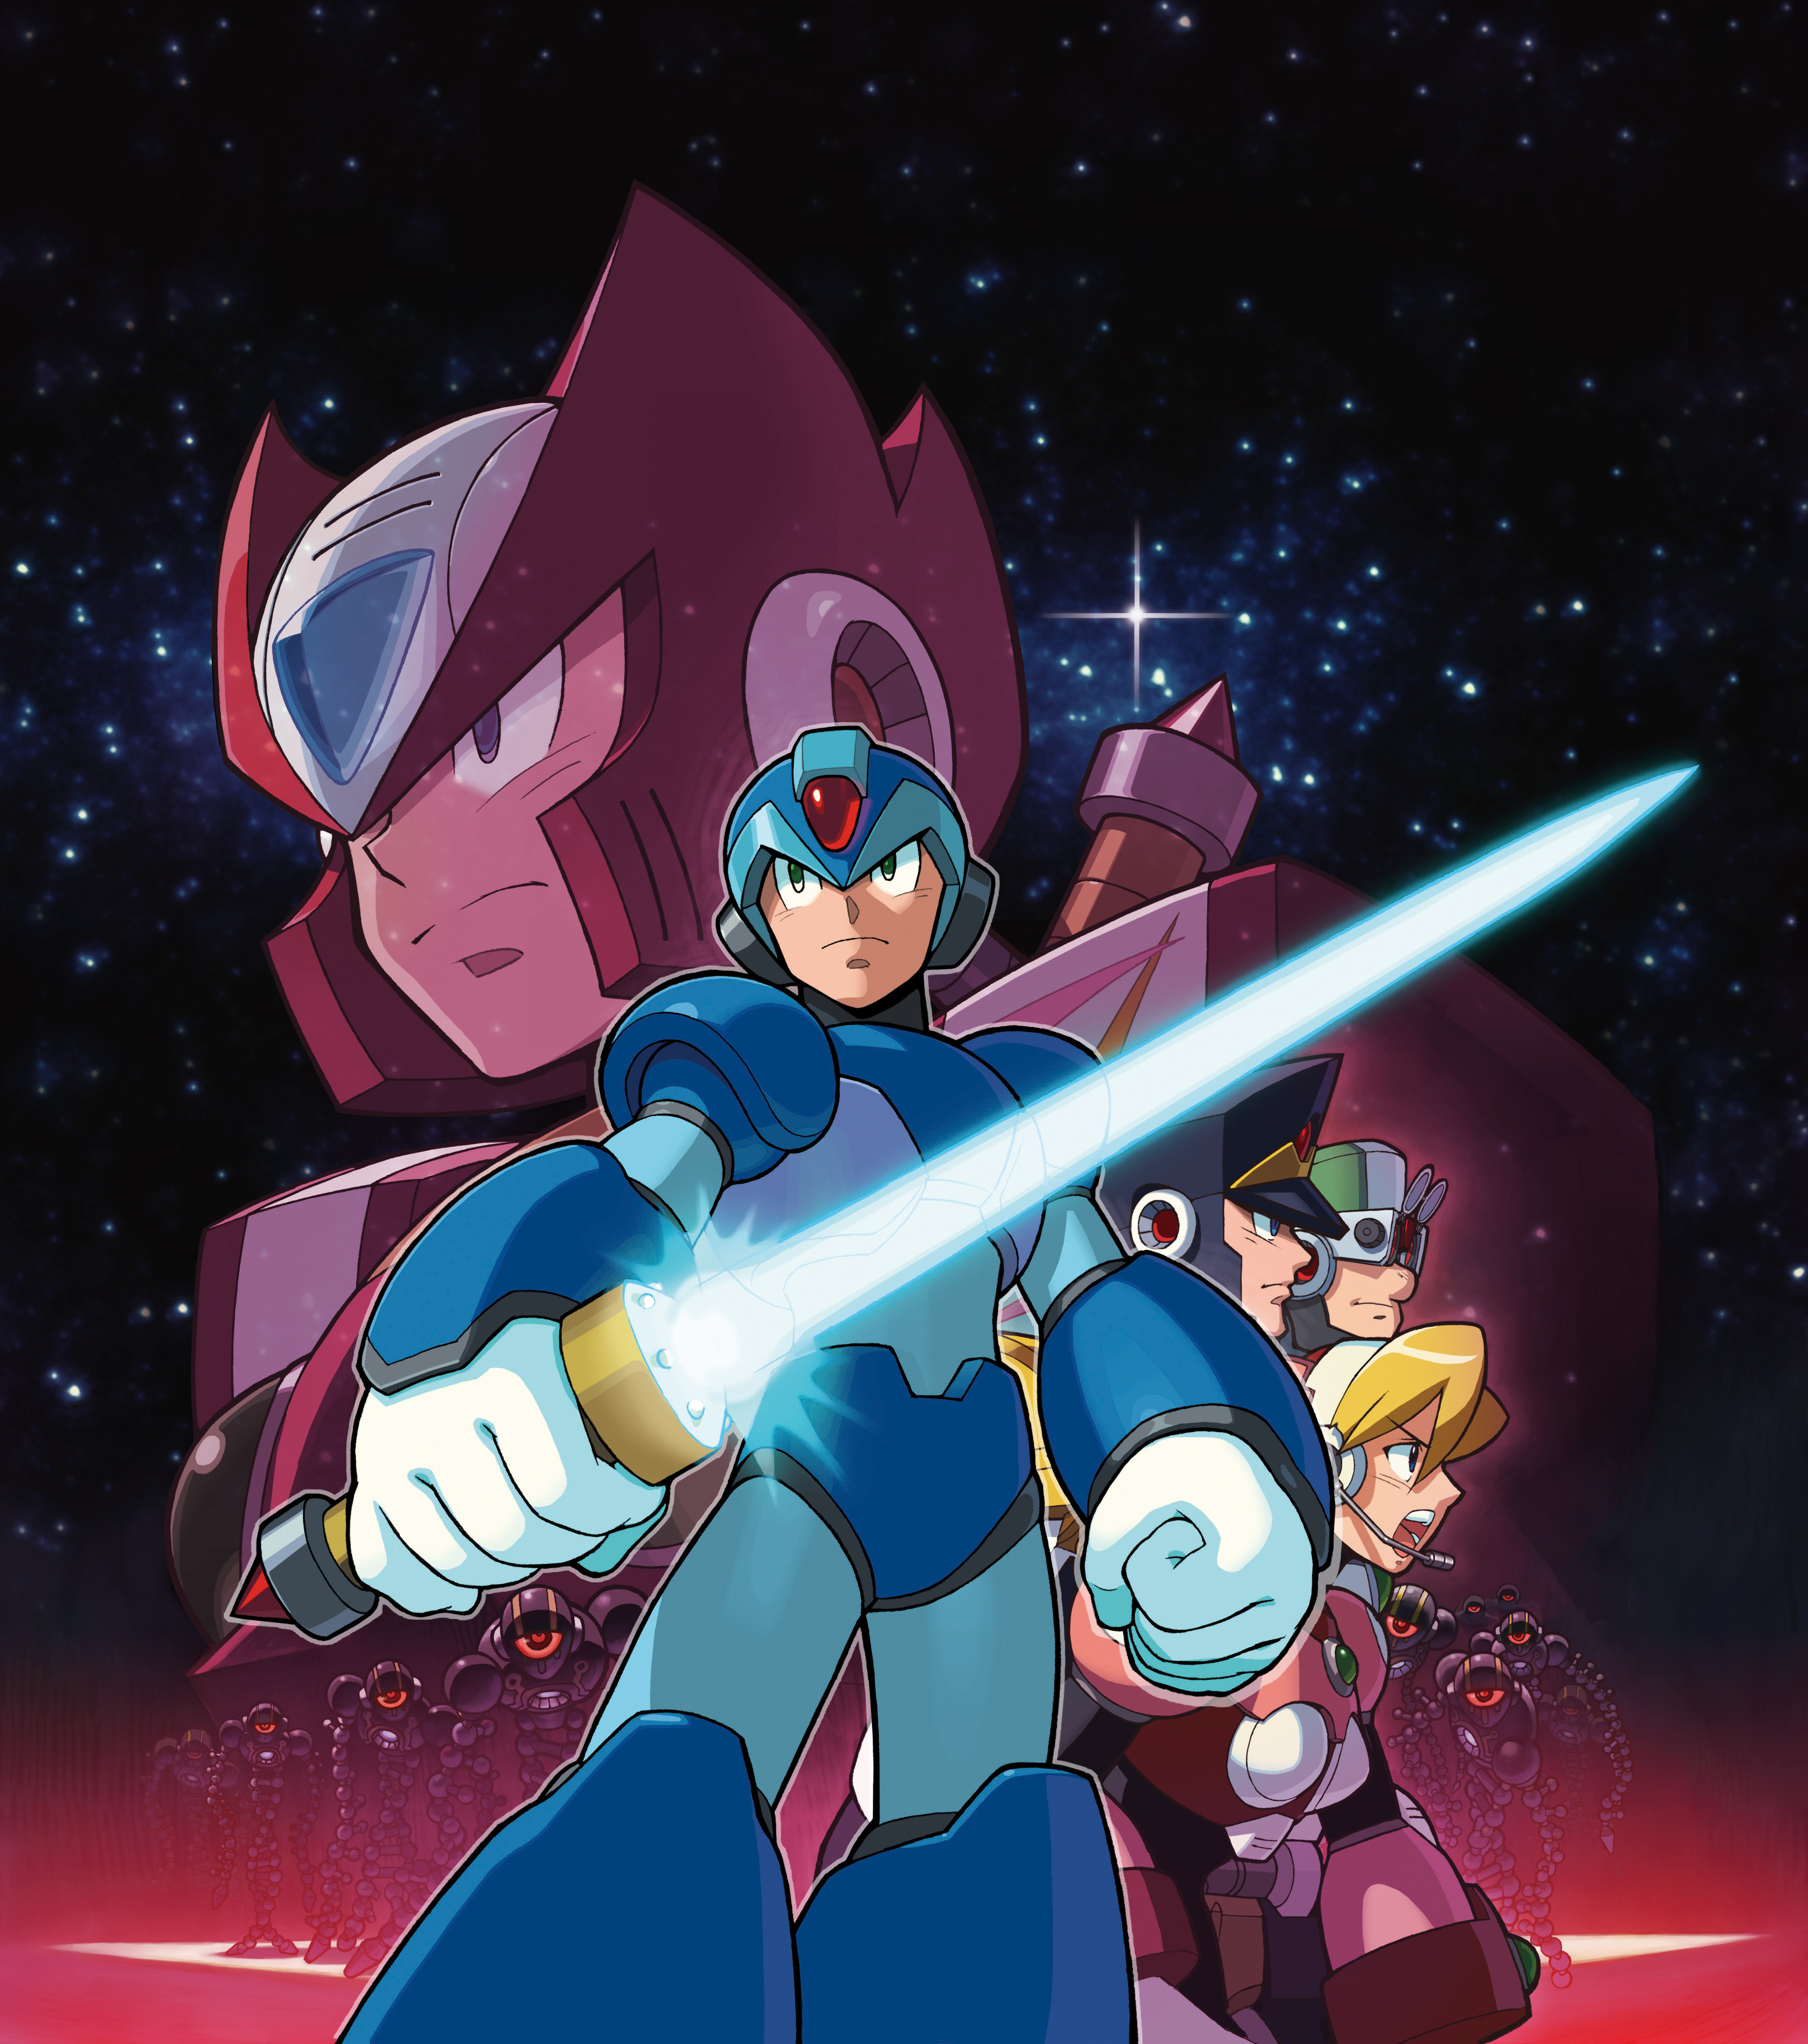 Mega man x6 mmkb fandom powered by wikia - Megaman wikia ...